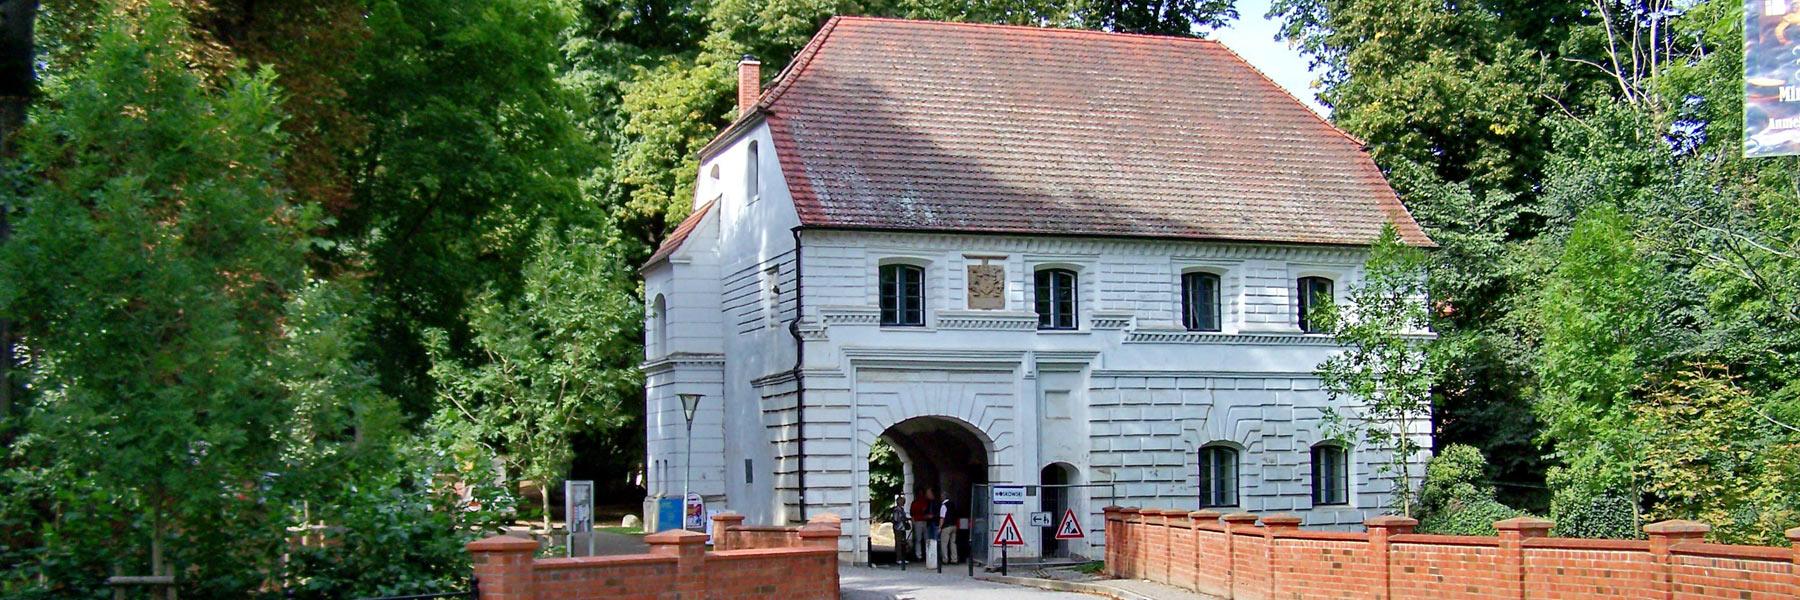 Torhaus - Mirow